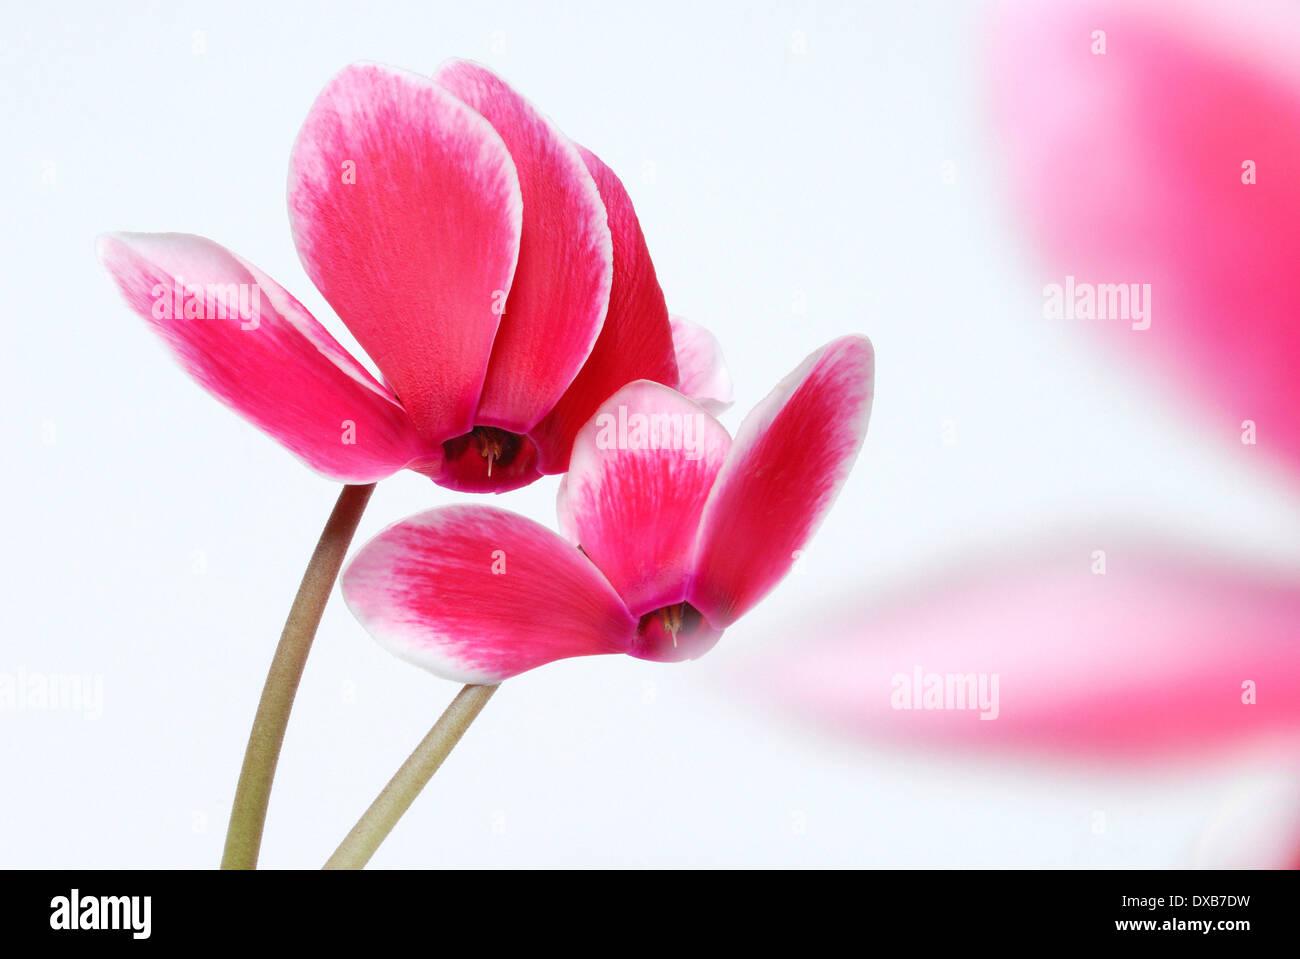 Cyclamen - Stock Image